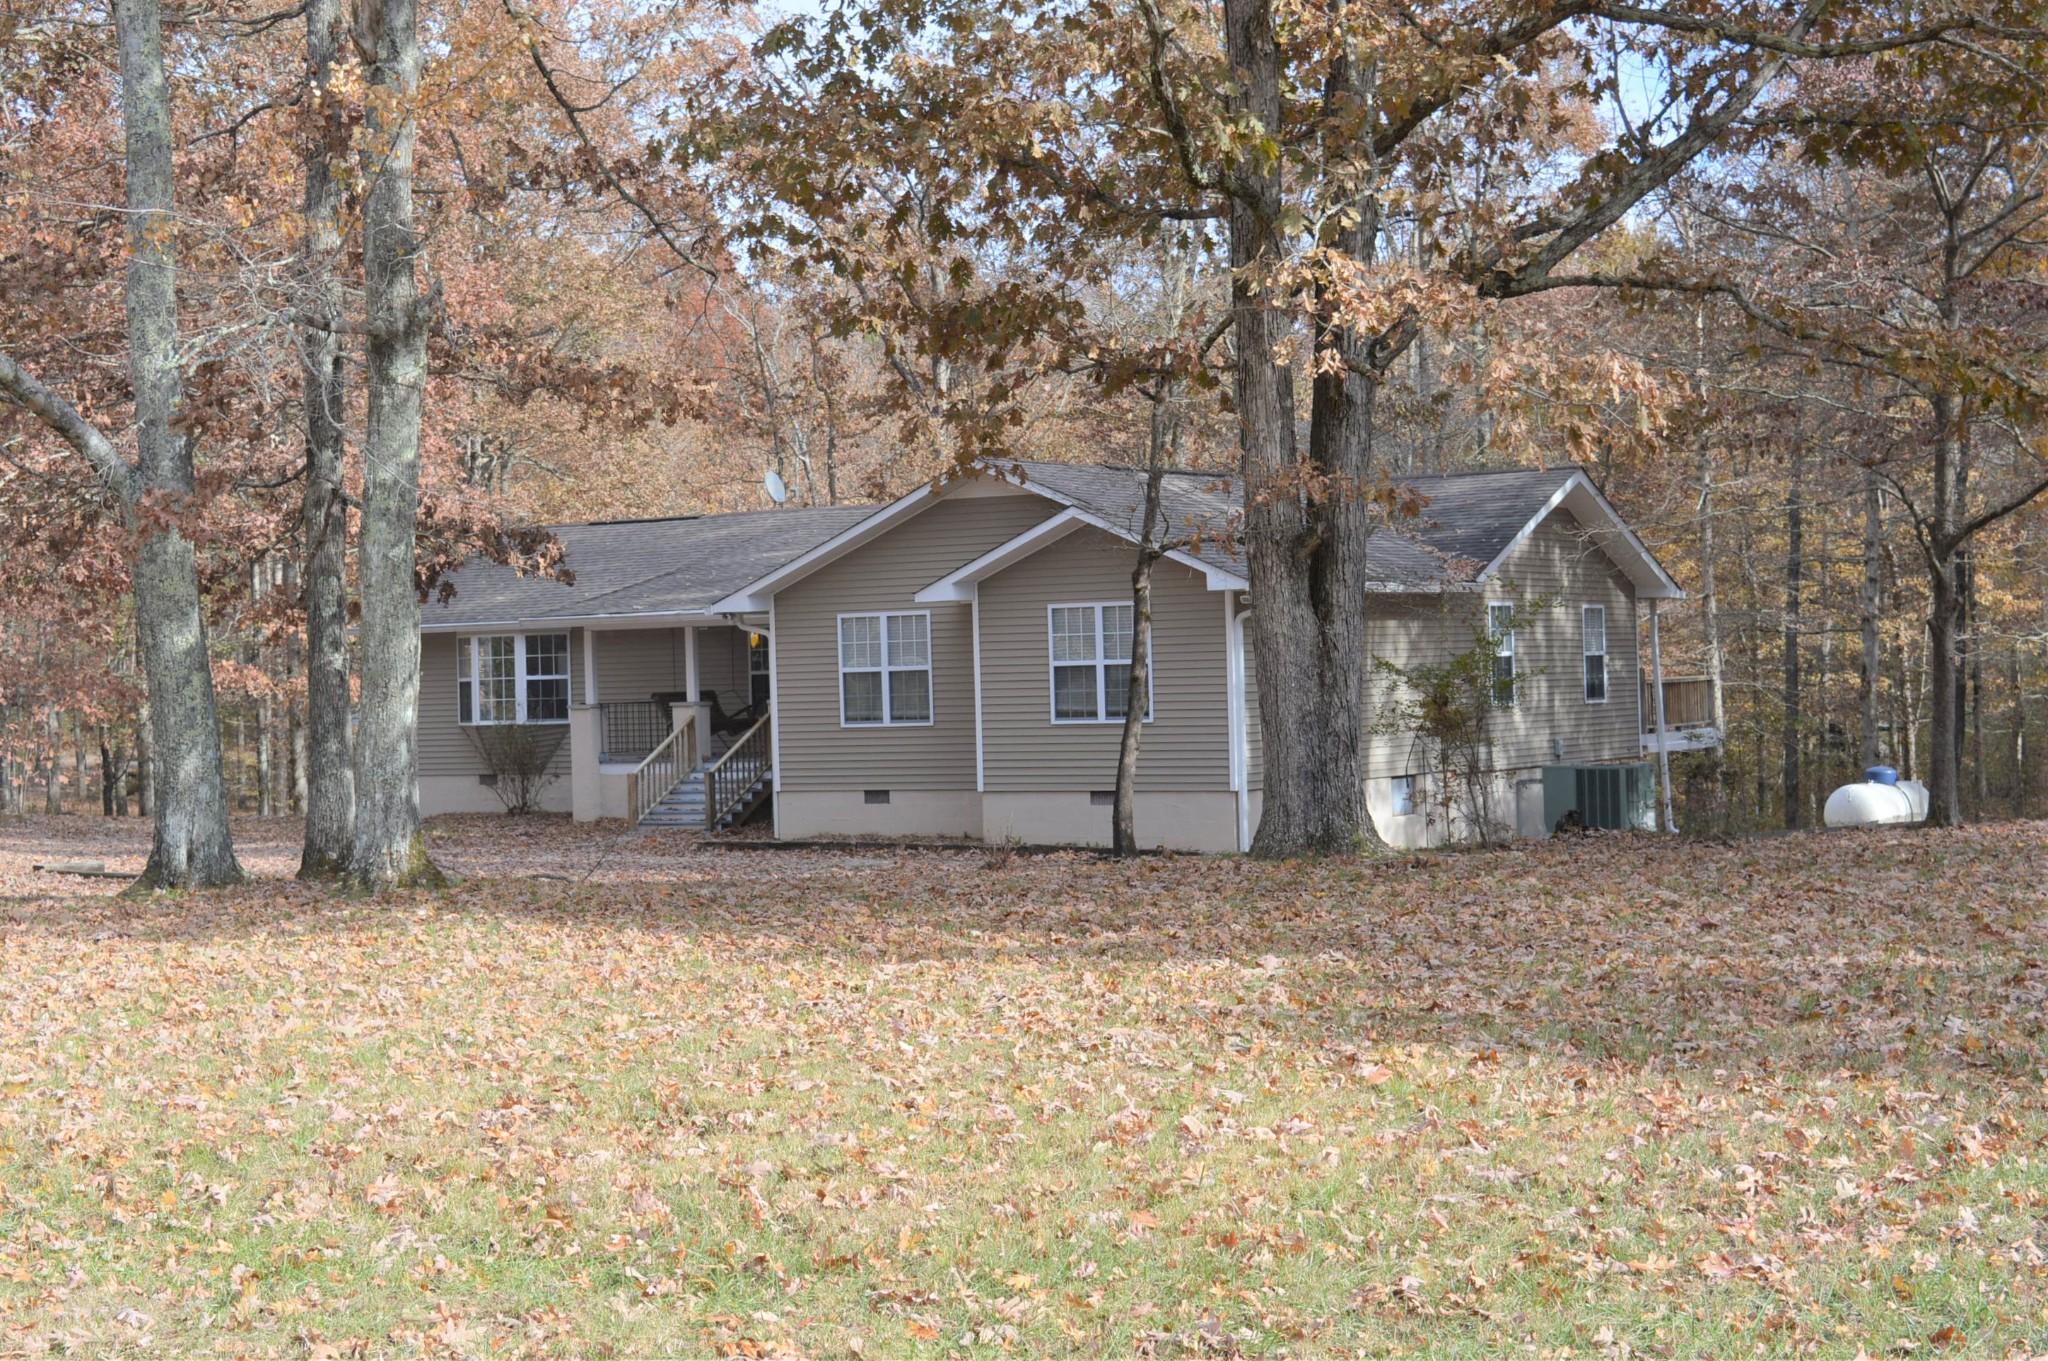 149 Gudger Rd, Sewanee, TN 37375 - Sewanee, TN real estate listing